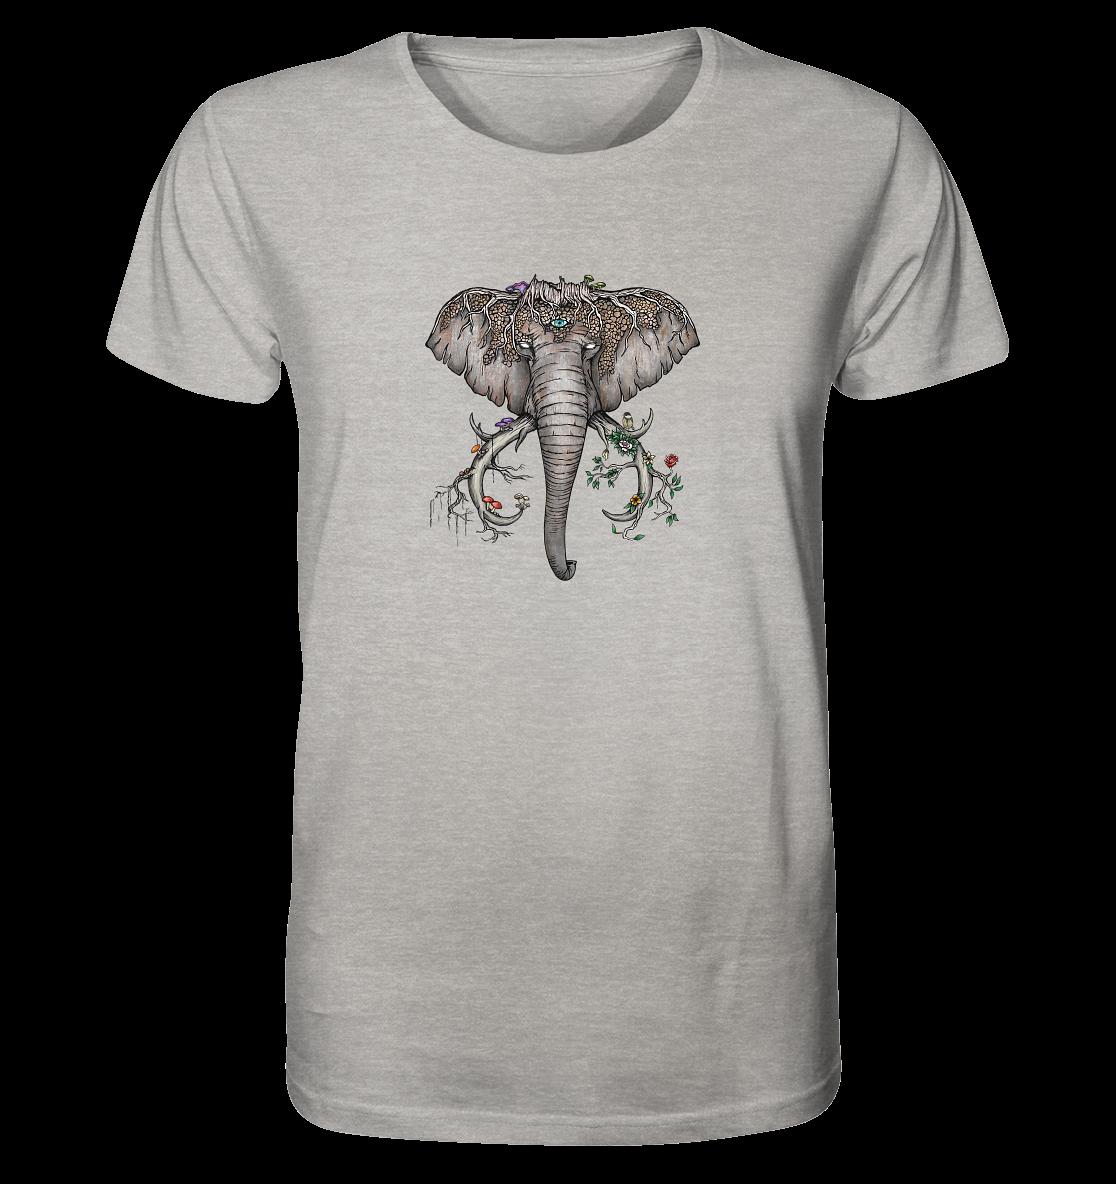 front-organic-shirt-meliert-c2c1c0-1116x-2.png